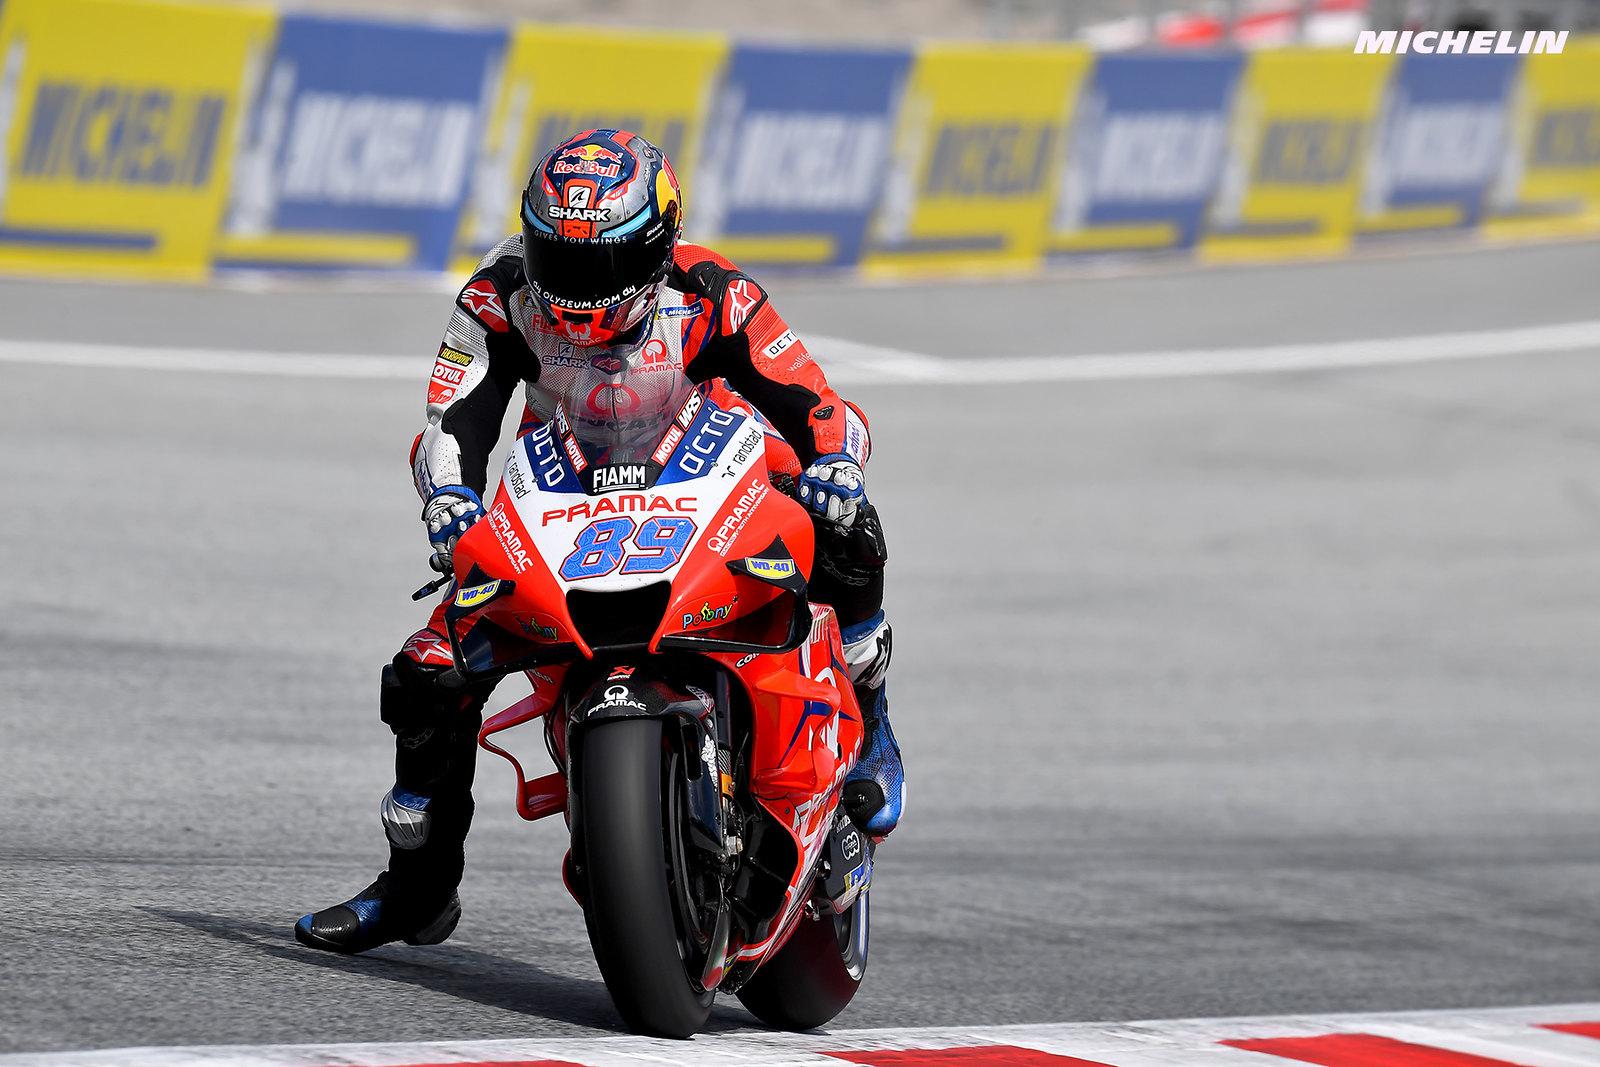 MotoGP2021 スティリアGP 予選1位ホルヘ・マルティン「ポール獲得の可能性はあると思っていた」